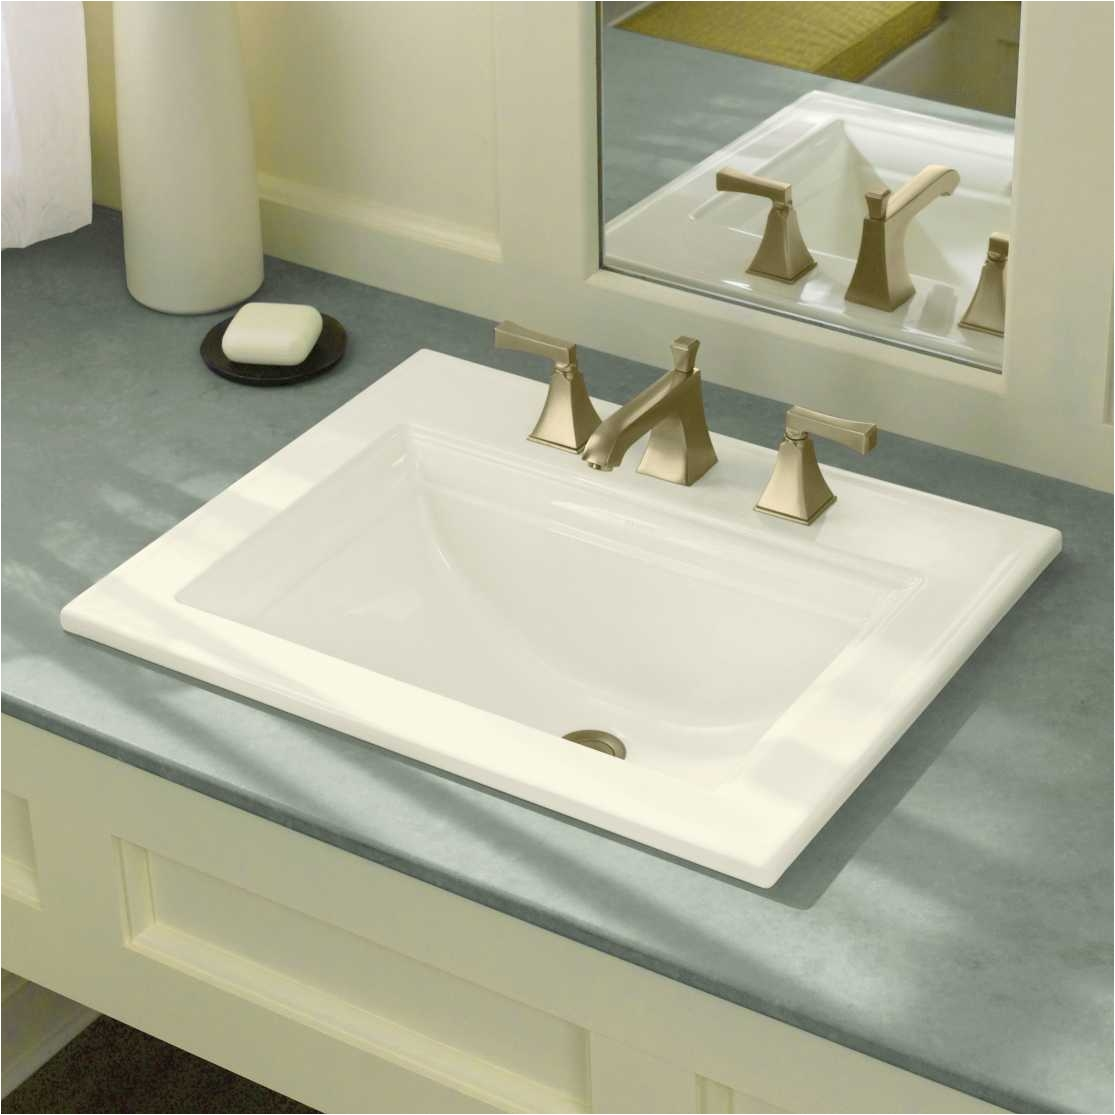 bathtub liners lowes choosed for elegant toilets lowes 0d gpyt info